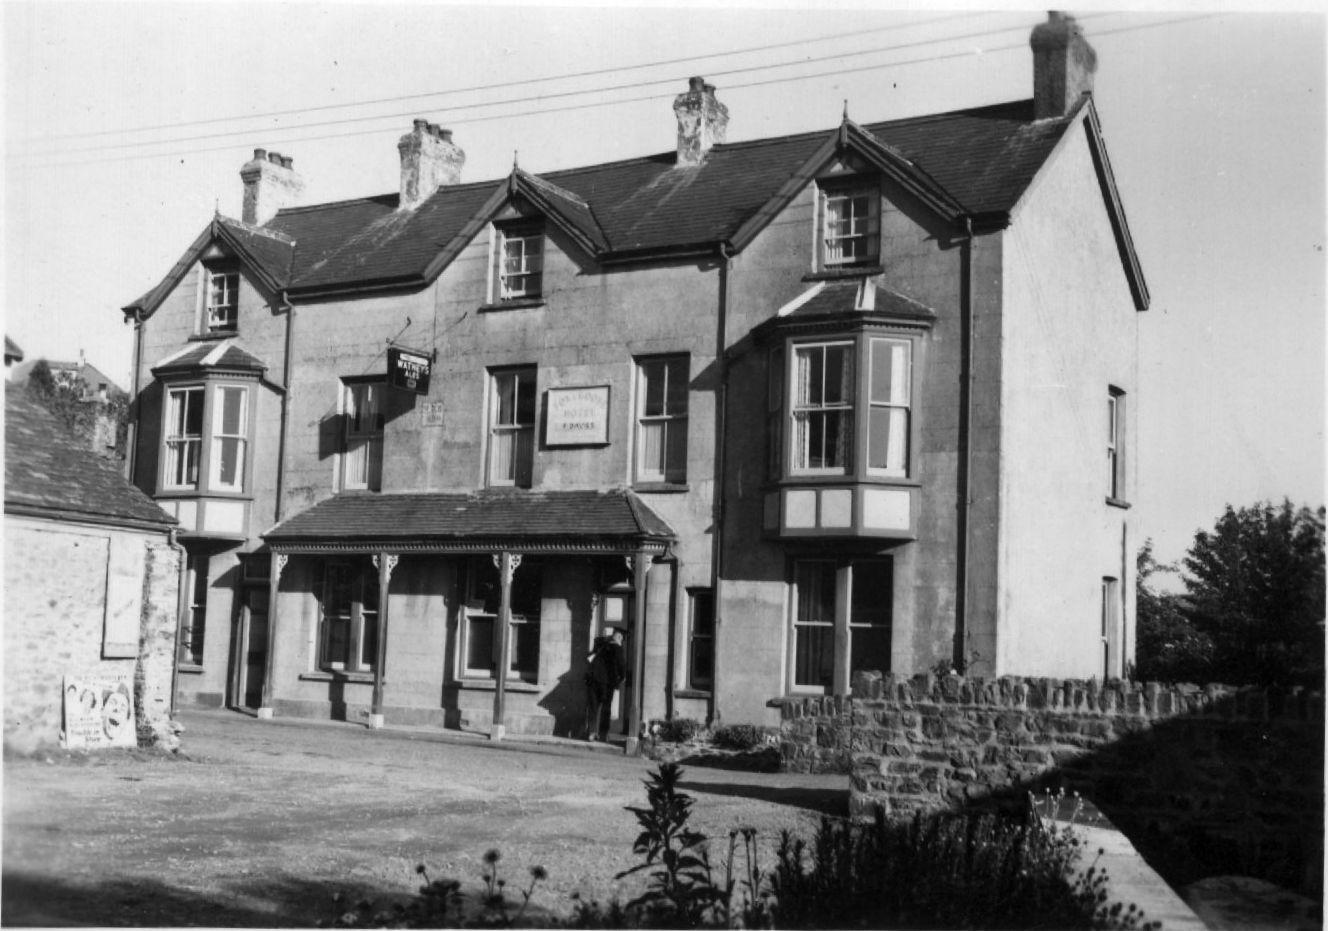 Fox and Goose Pub Parracombe, Exmoor - Kind permission of Barbara Daltrey